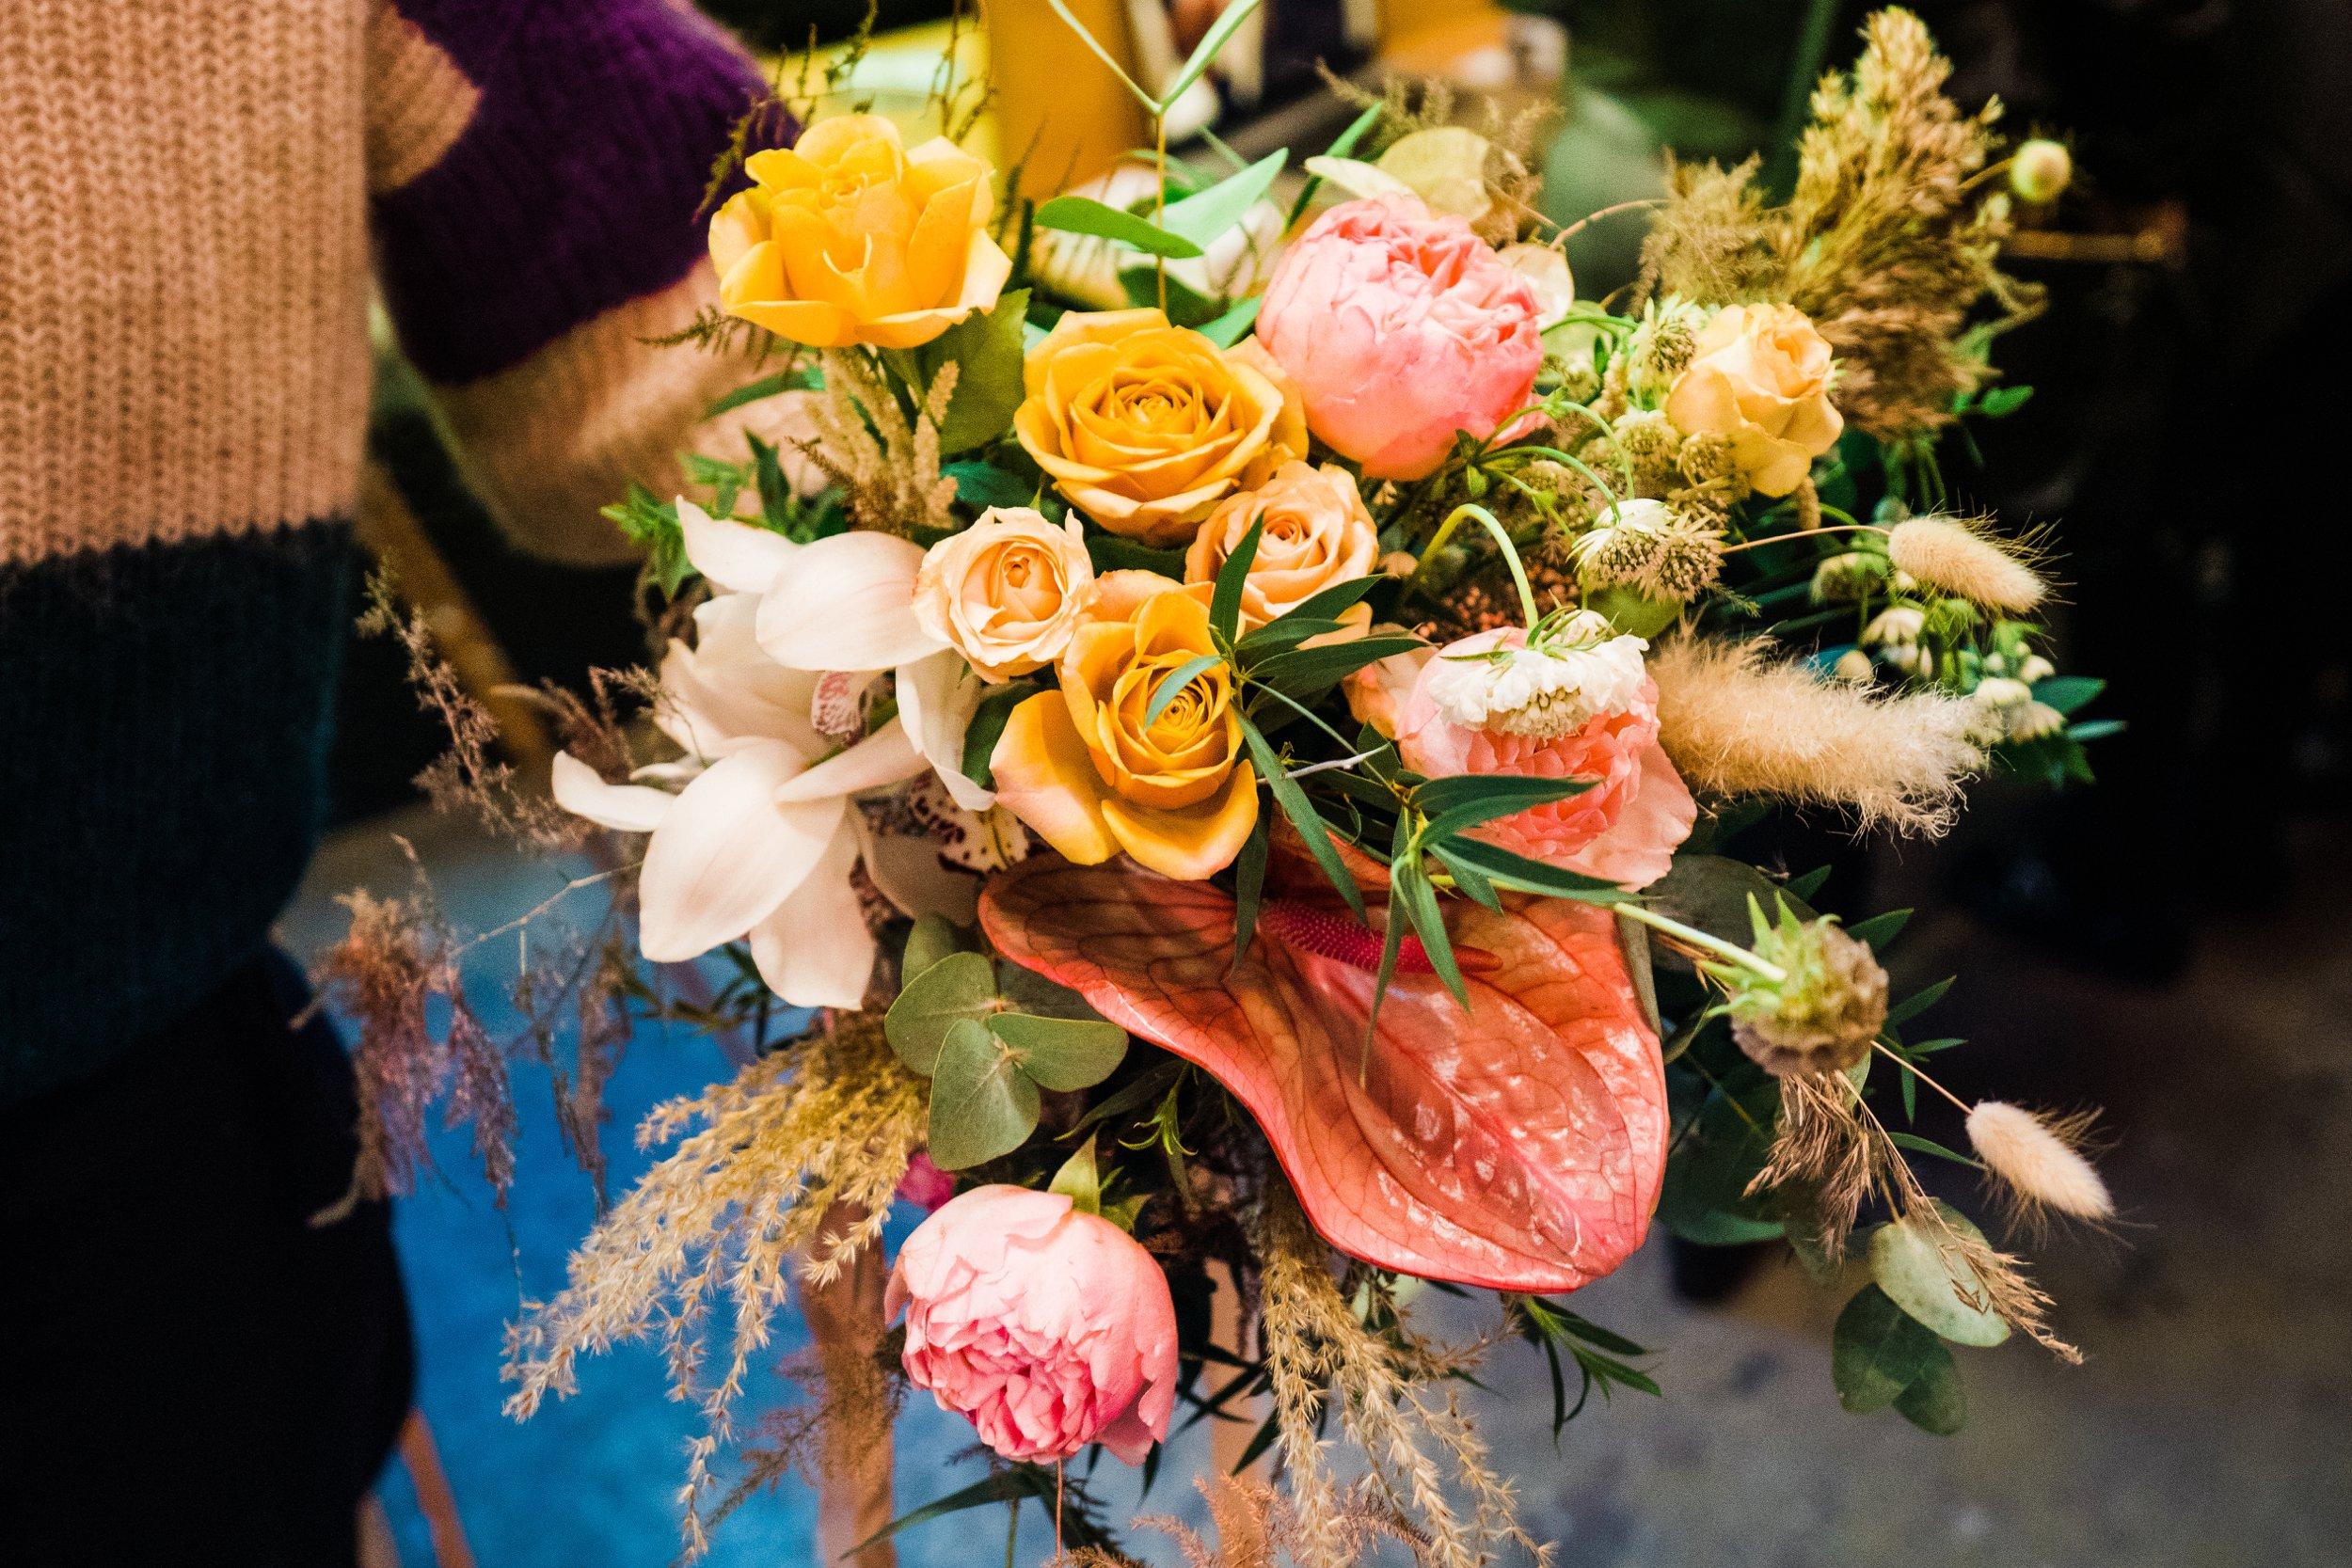 The UN-WEDDING SHOW 2019 cool bride style modern wedding fair Leeds Duke Studios 00020.jpg